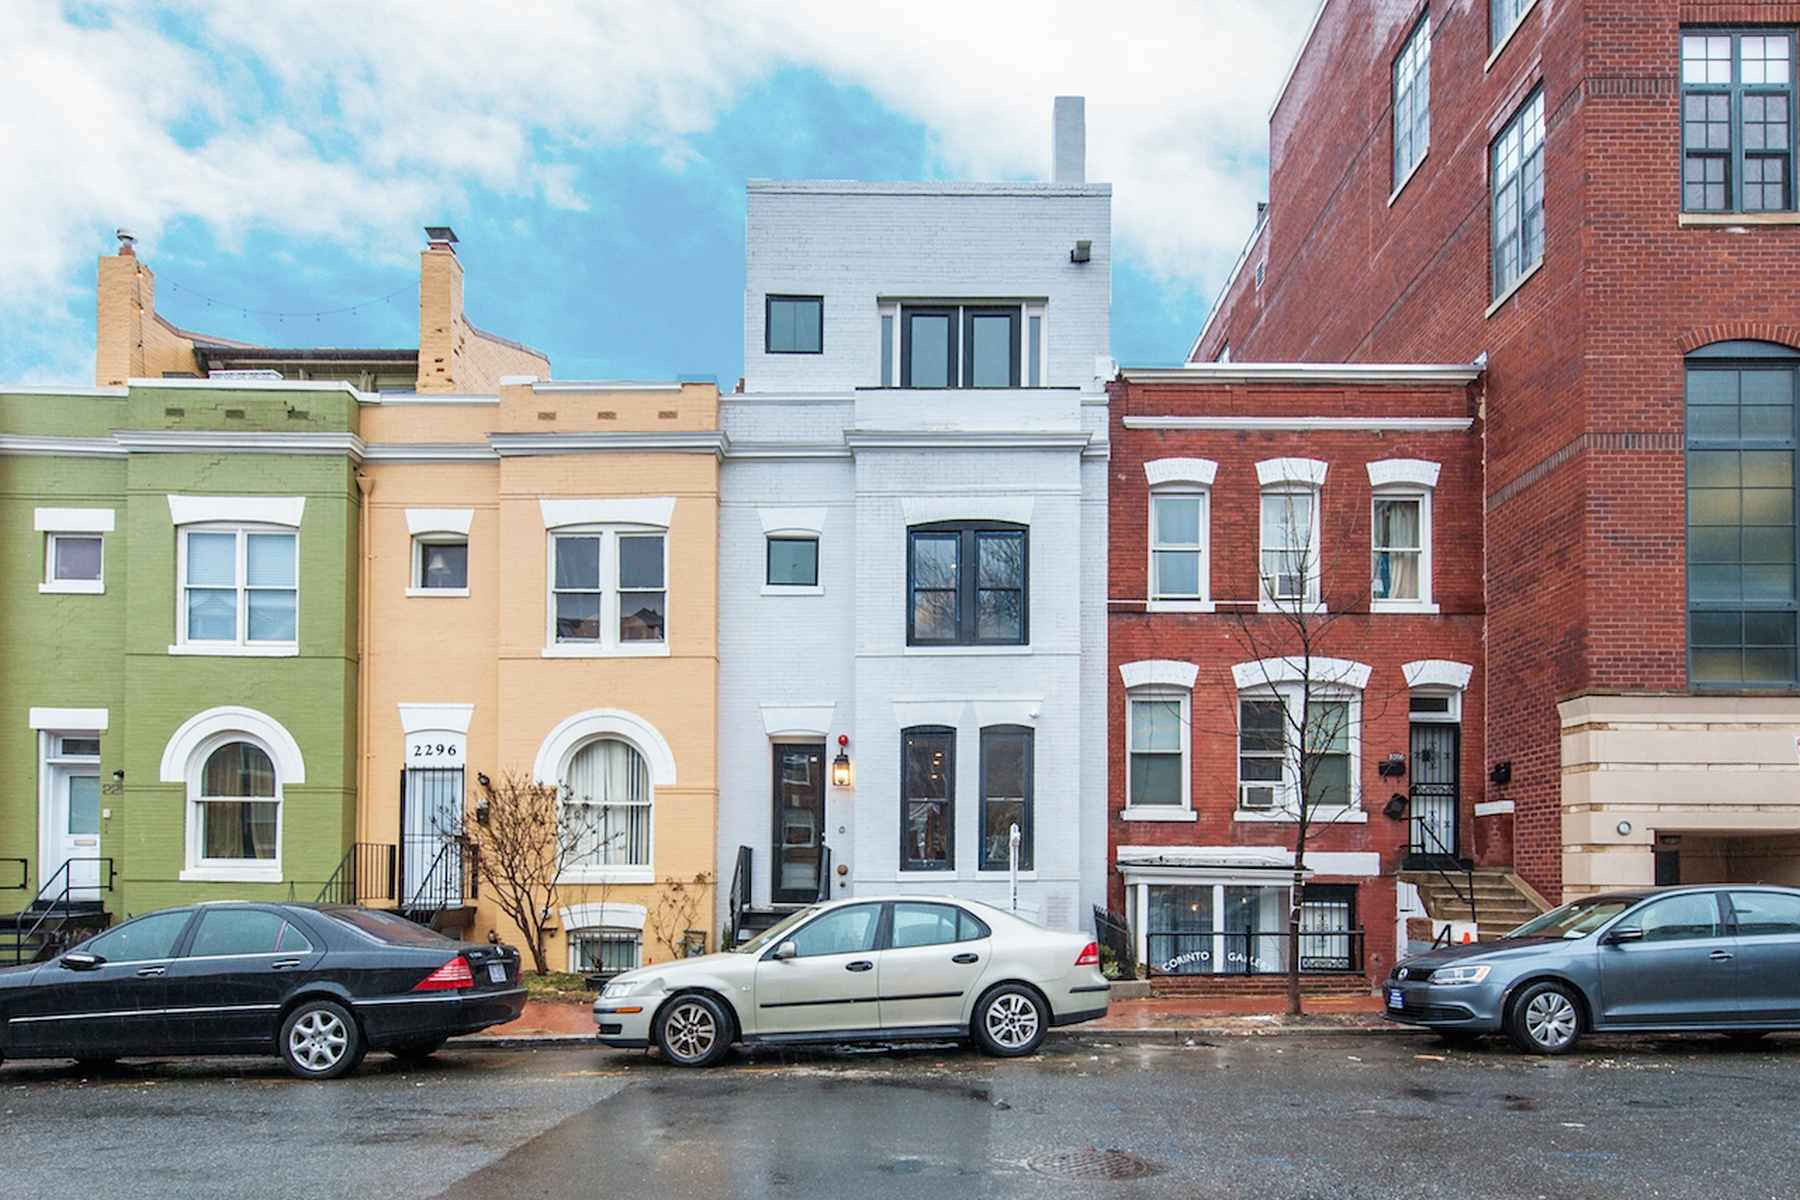 Condominium for Sale at 2298 Champlain Street Nw A, Washington Washington, District Of Columbia 20009 United States